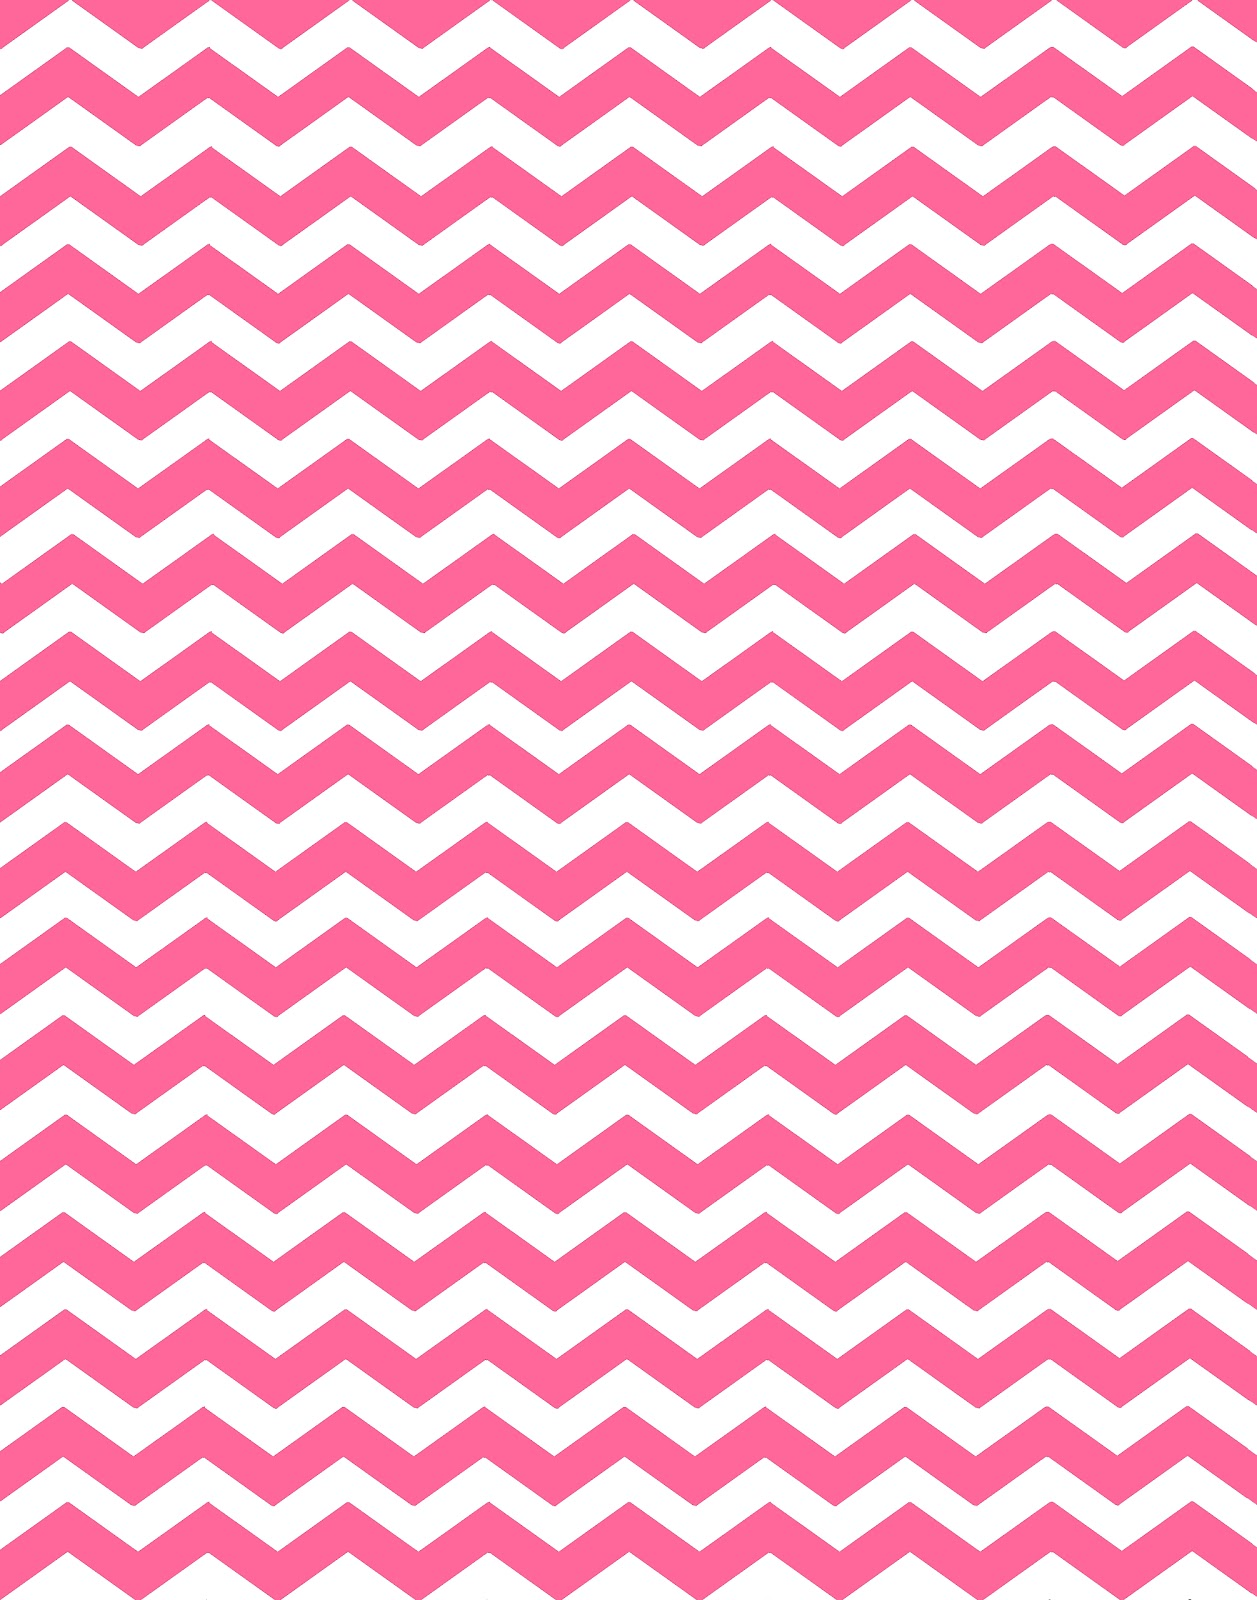 Pink chevron wallpaper wallpapersafari for Pink and white wallpaper